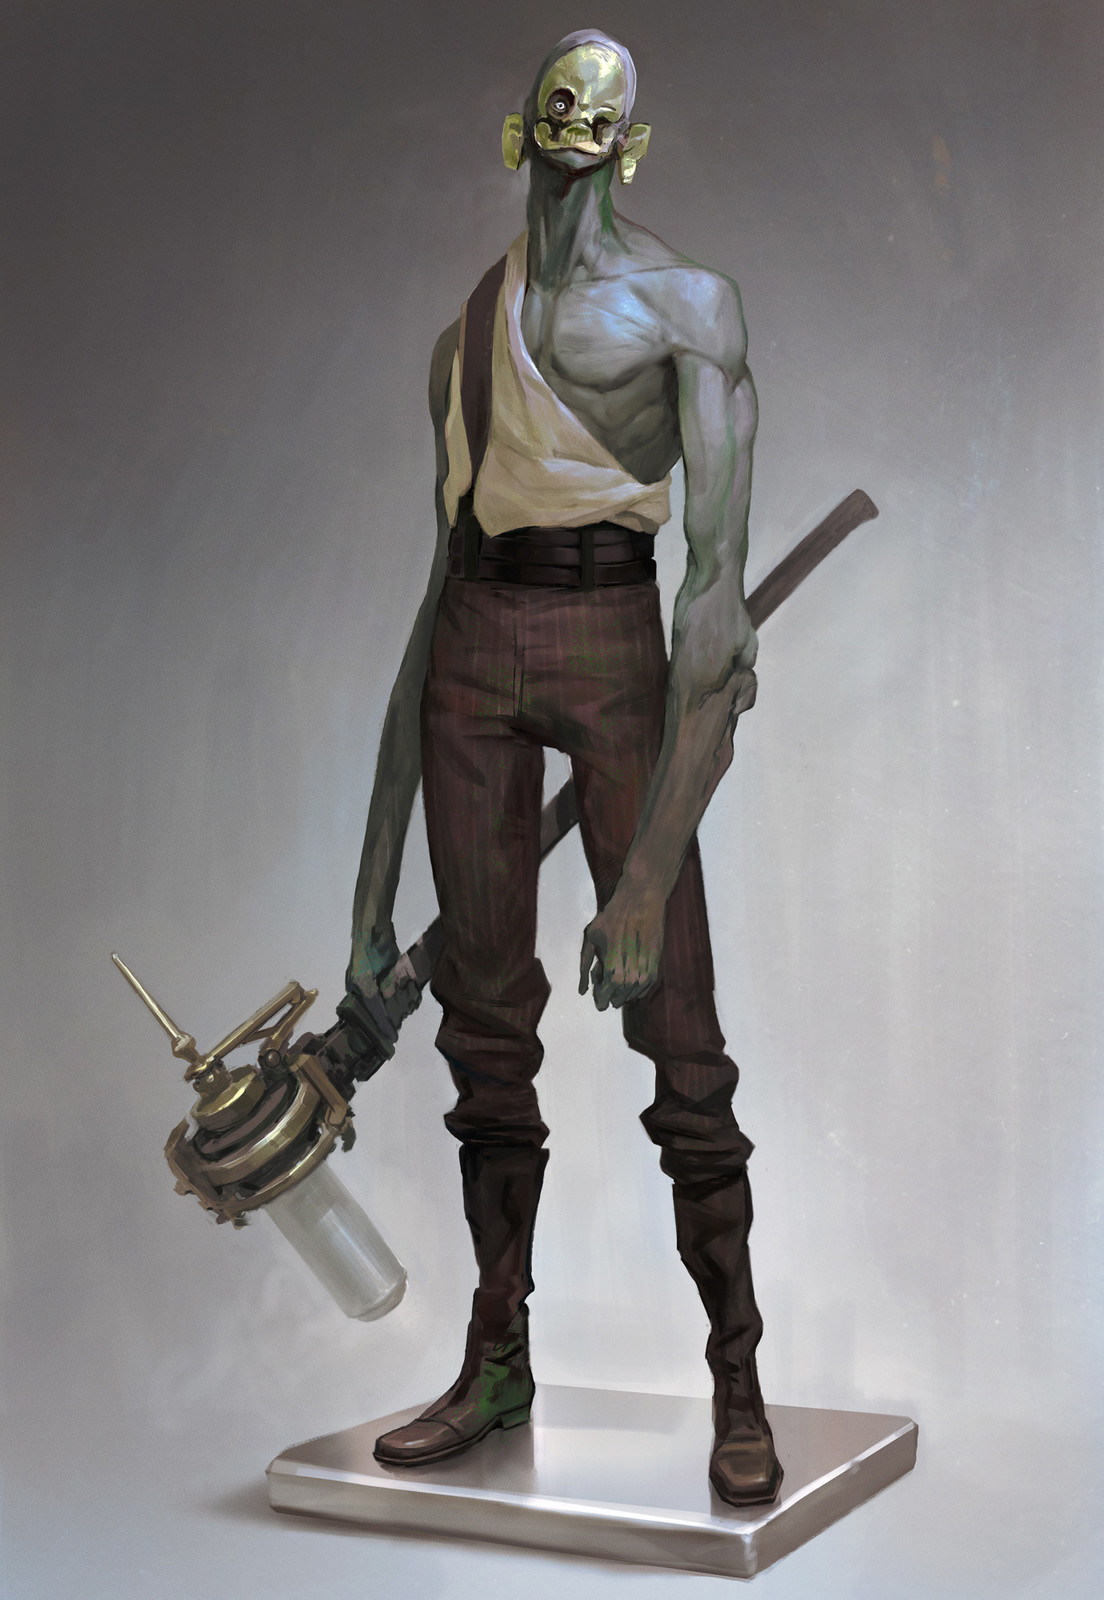 Concept by Konstantin Maystrenko